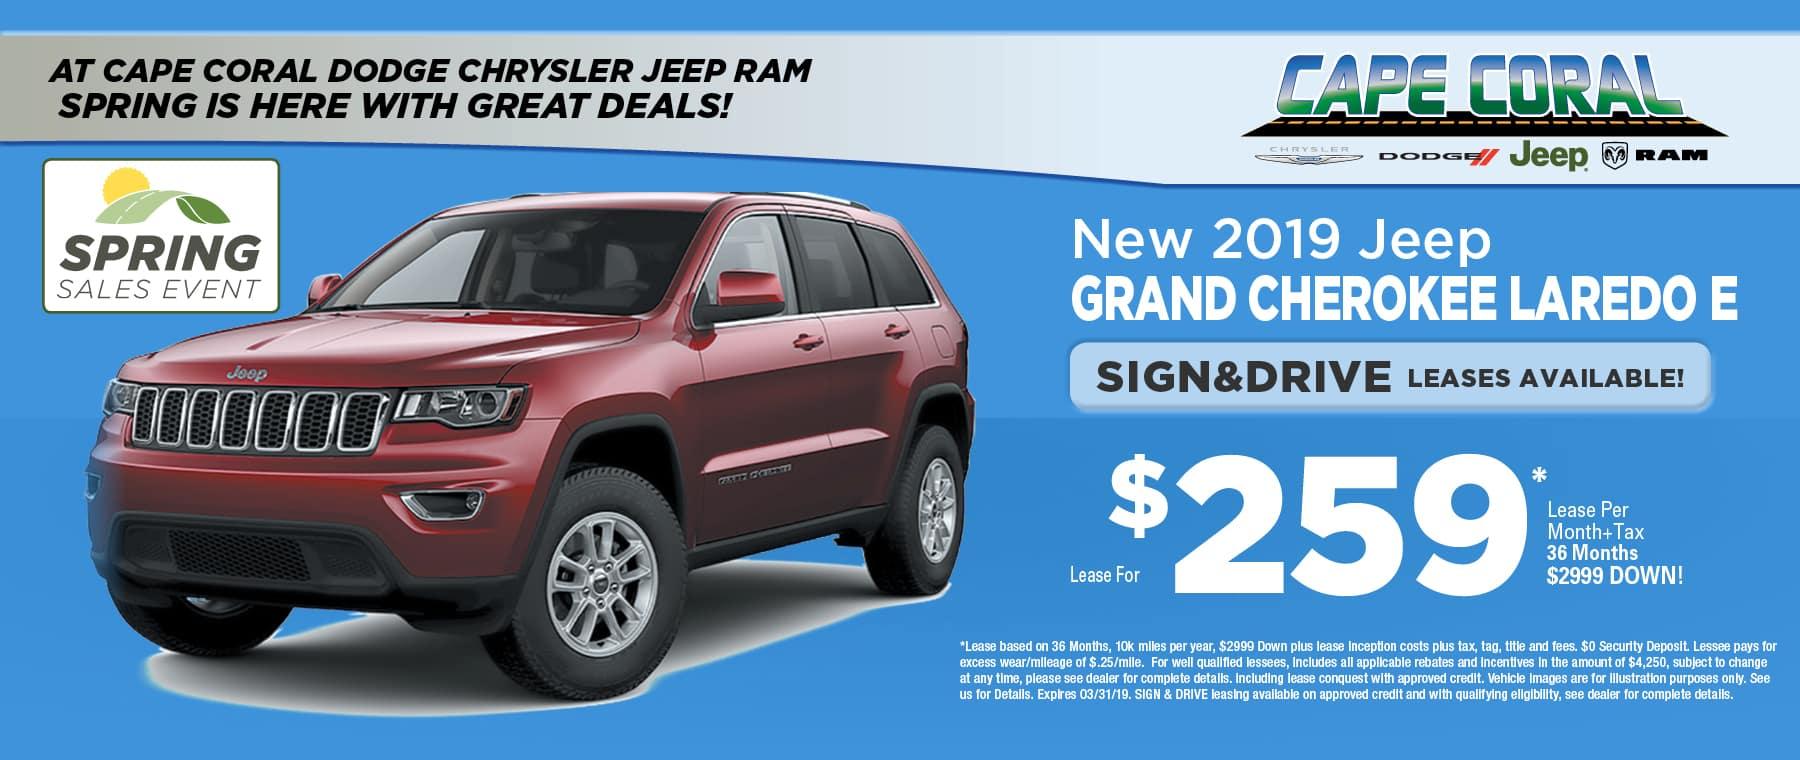 New 2019 Jeep Grand Cherokee!